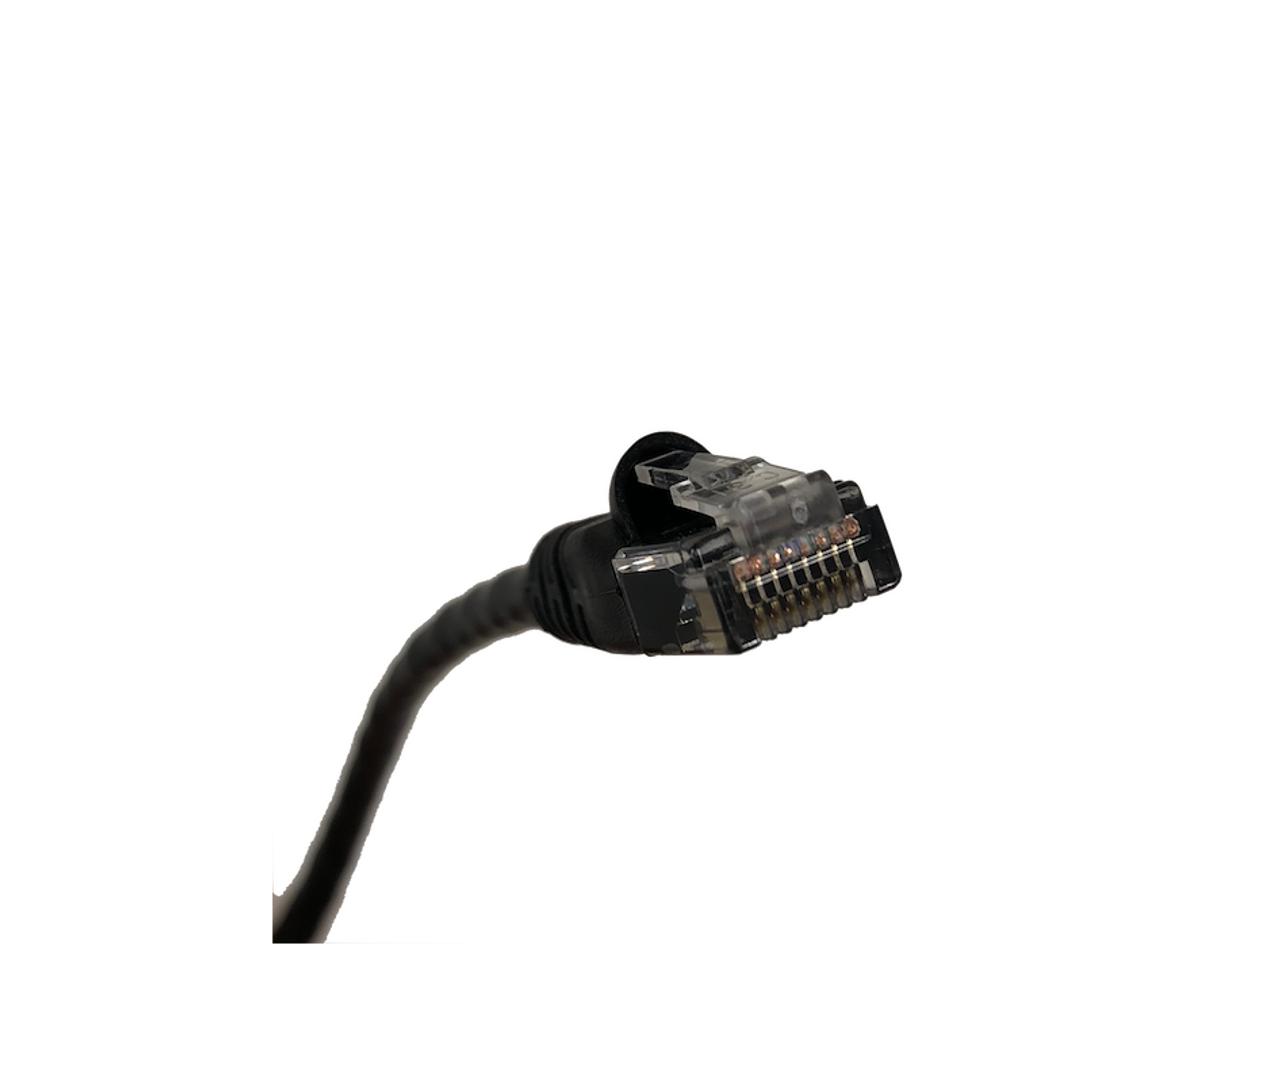 Category 5E UTP RJ45 Patch Cable Black - 1 ft